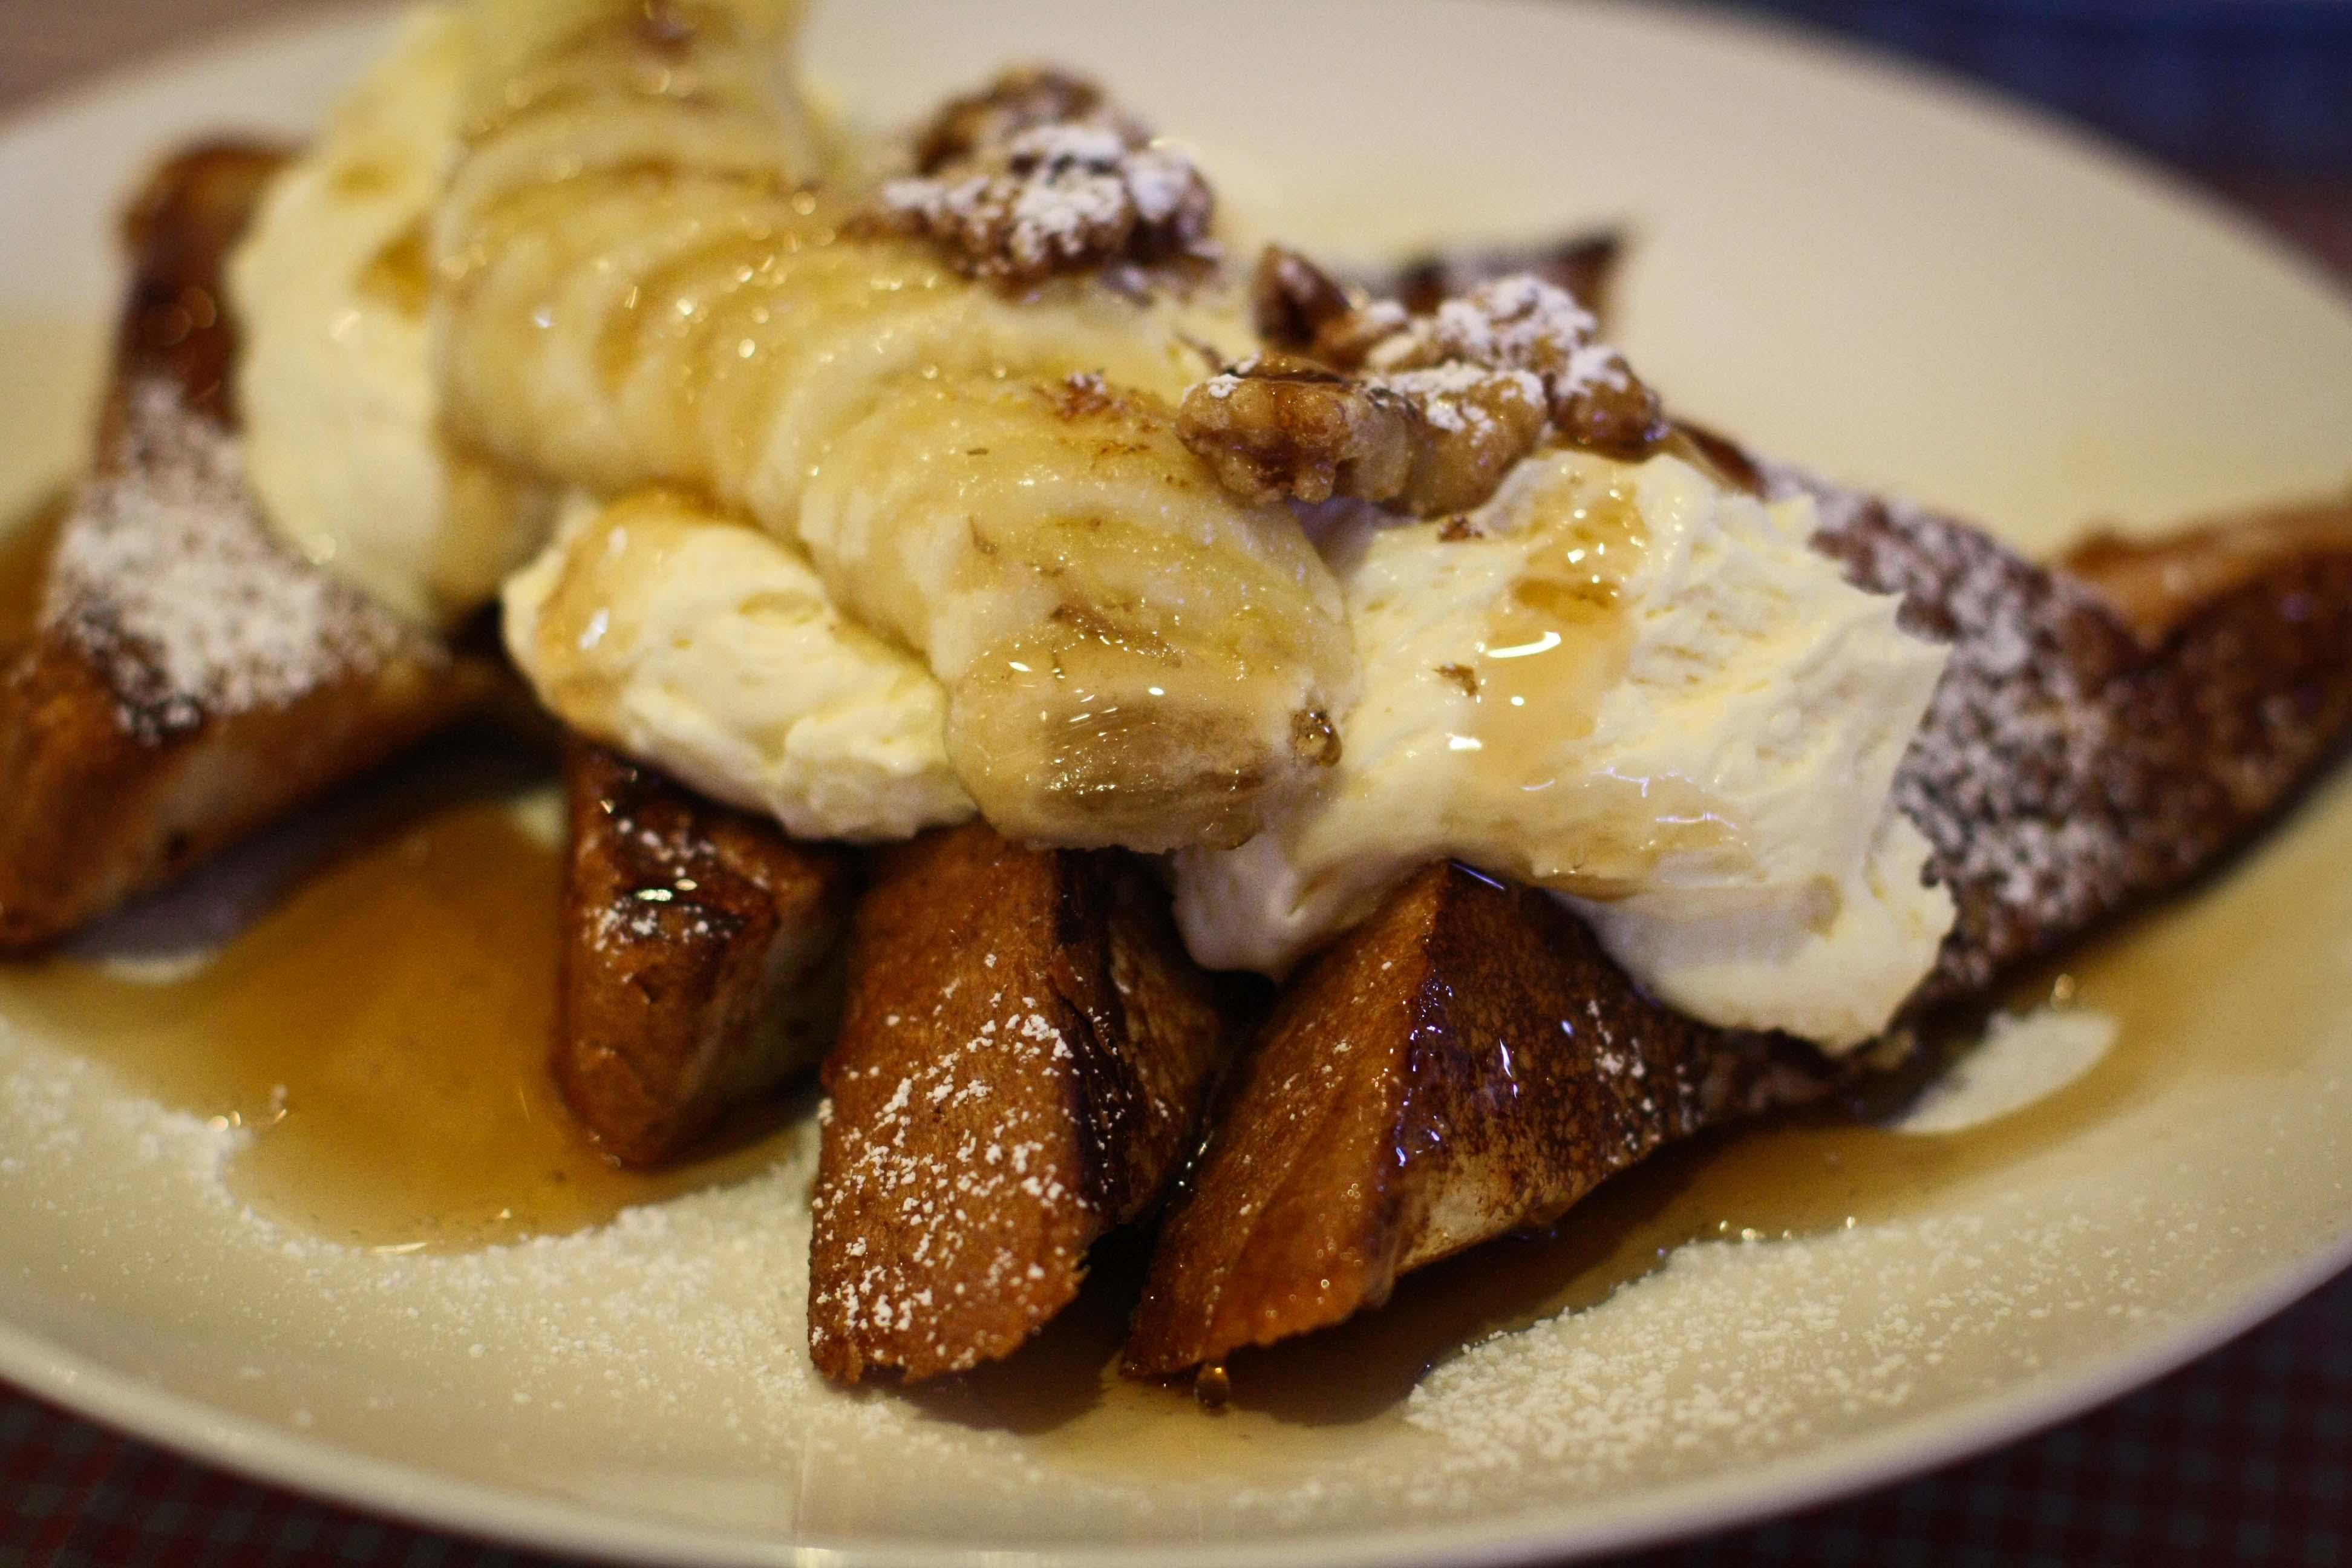 Stuffed French Toast - Caramelized Bananas, walnuts and banana pudding